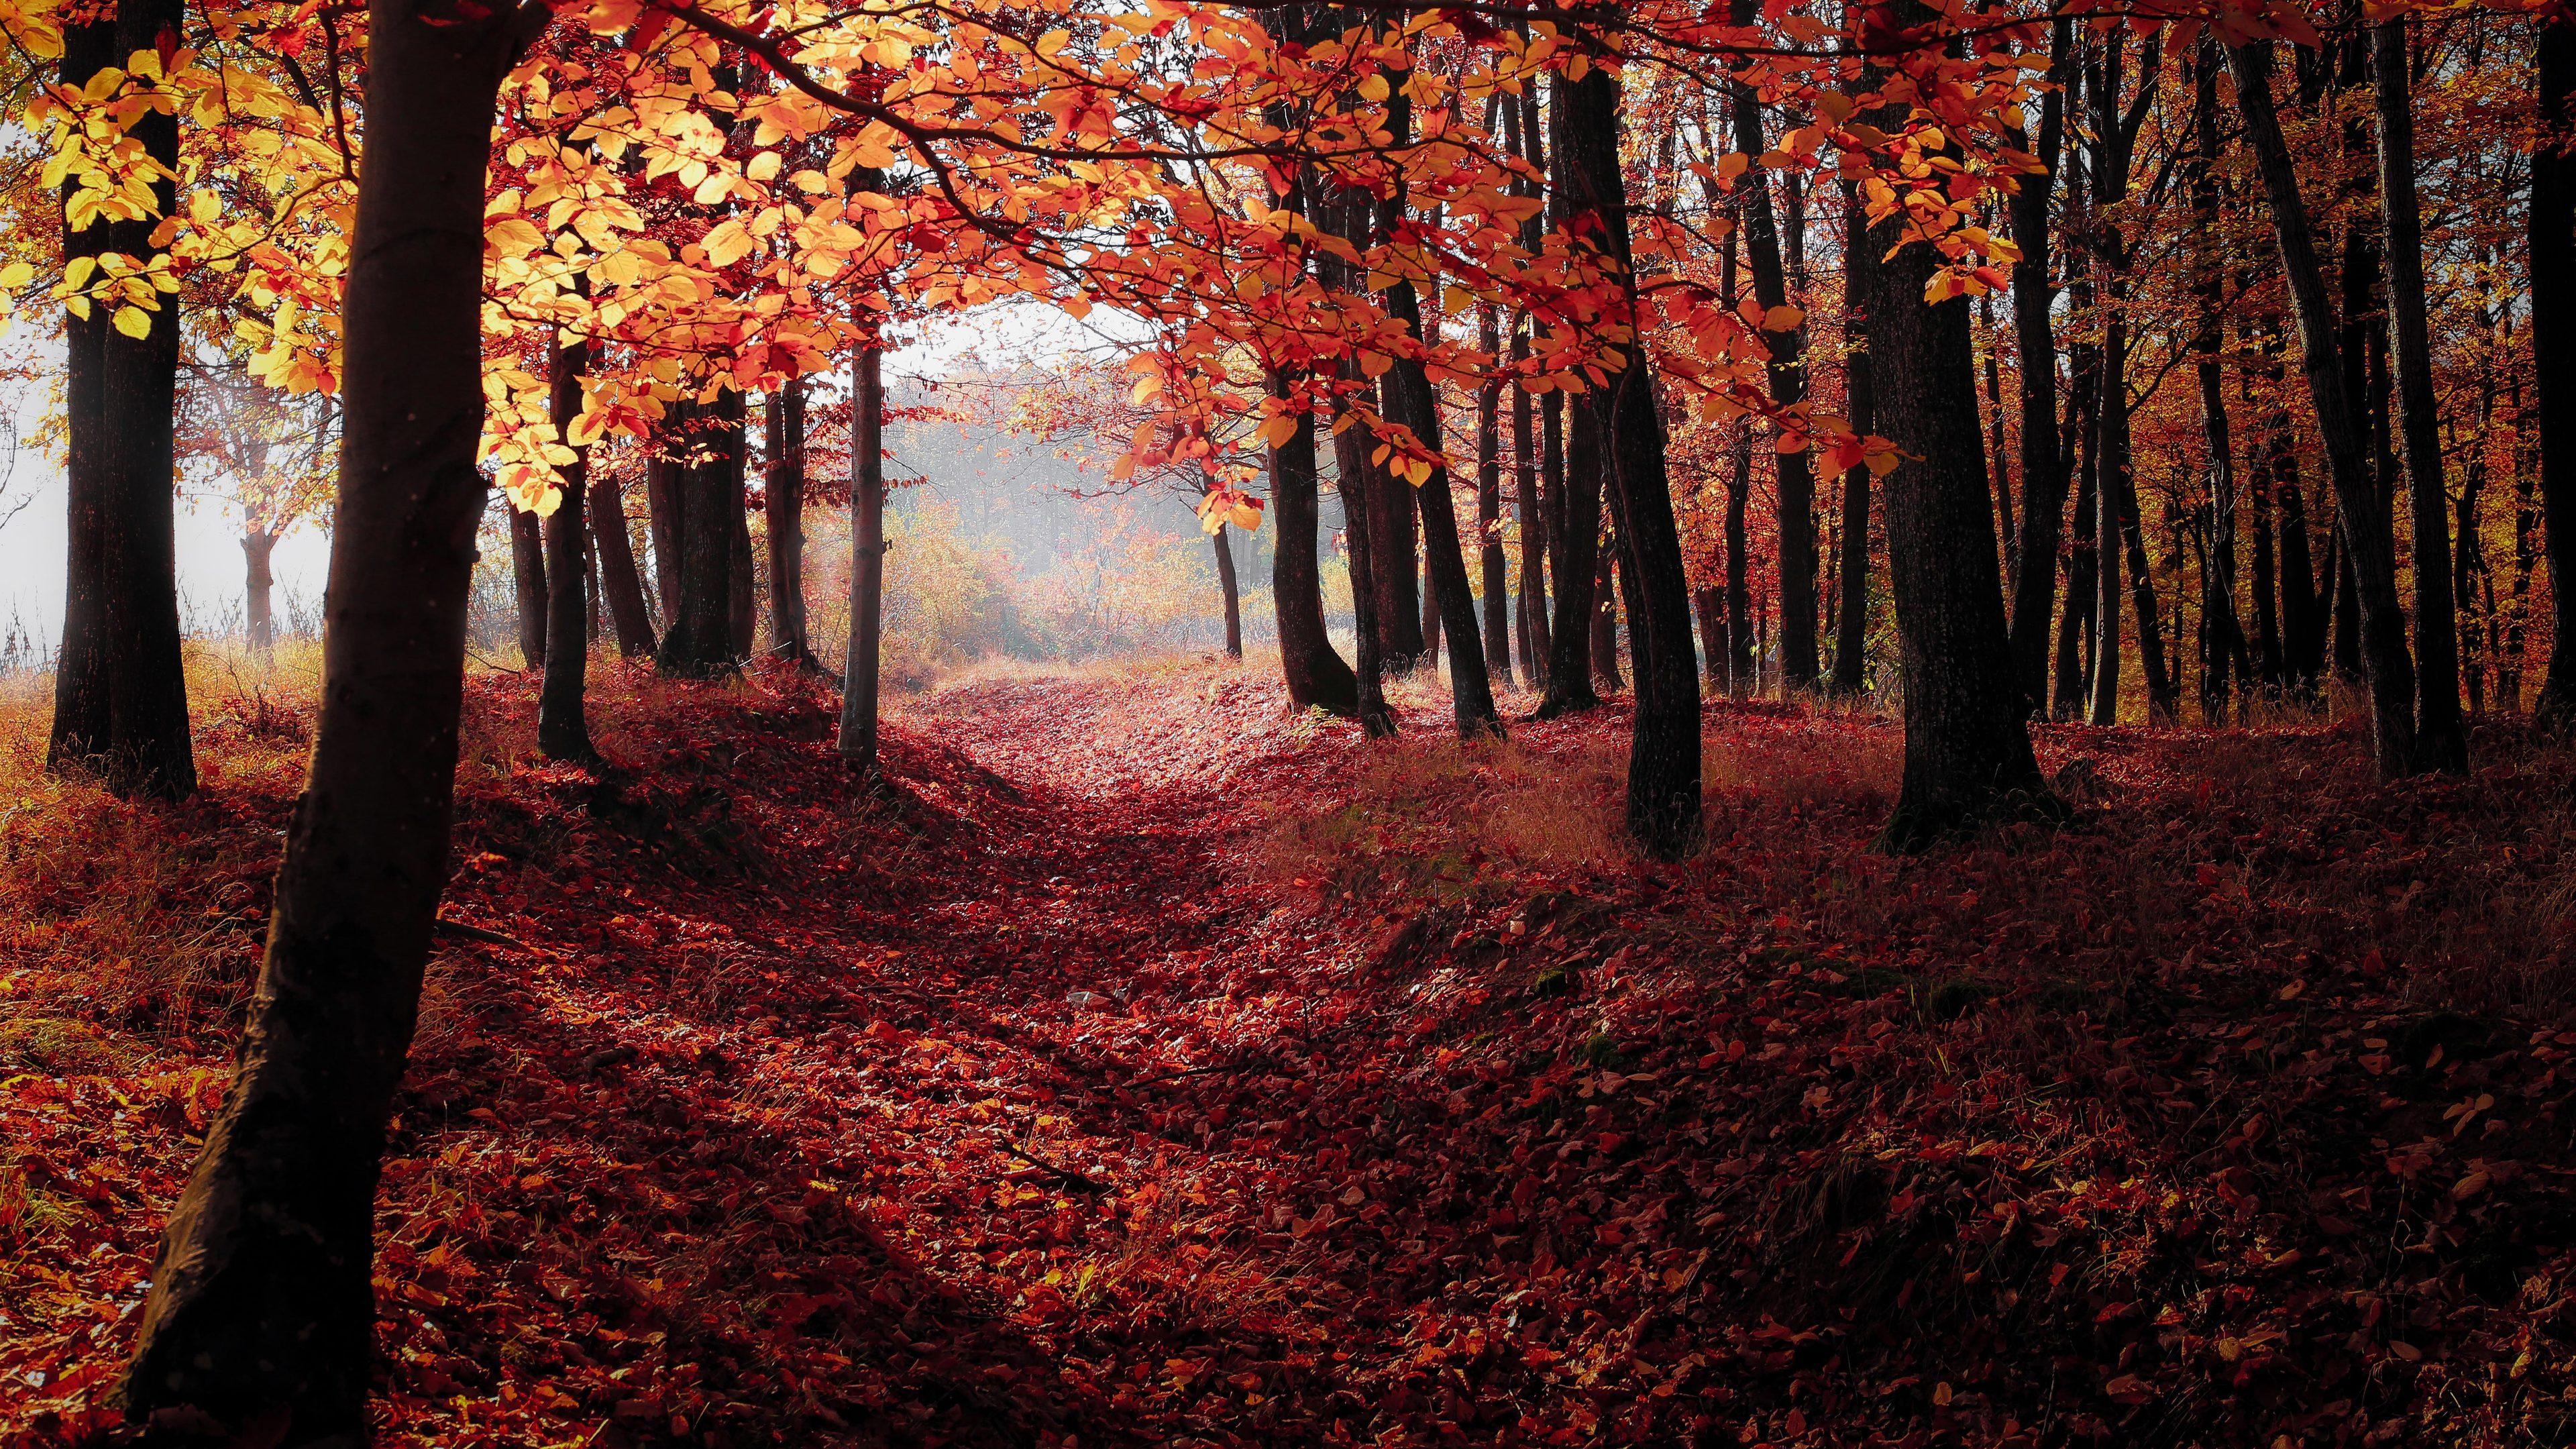 Wallpaper 4k Autumn Woods Trees Fall Forest 4k 4k Wallpapers